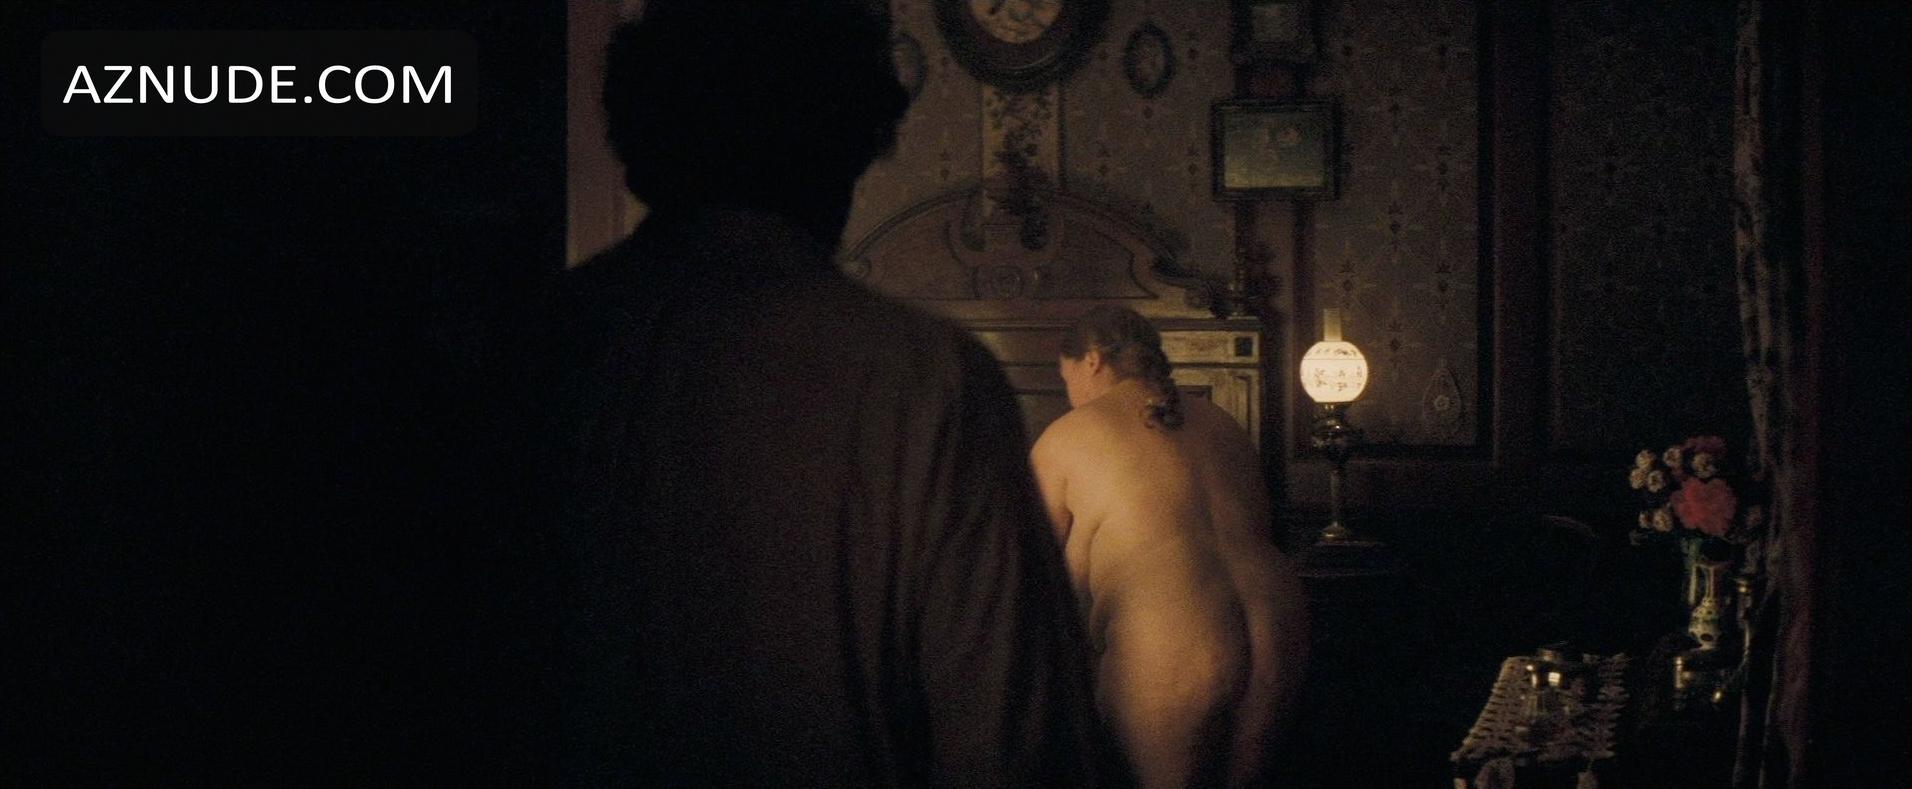 randy naked sex gif